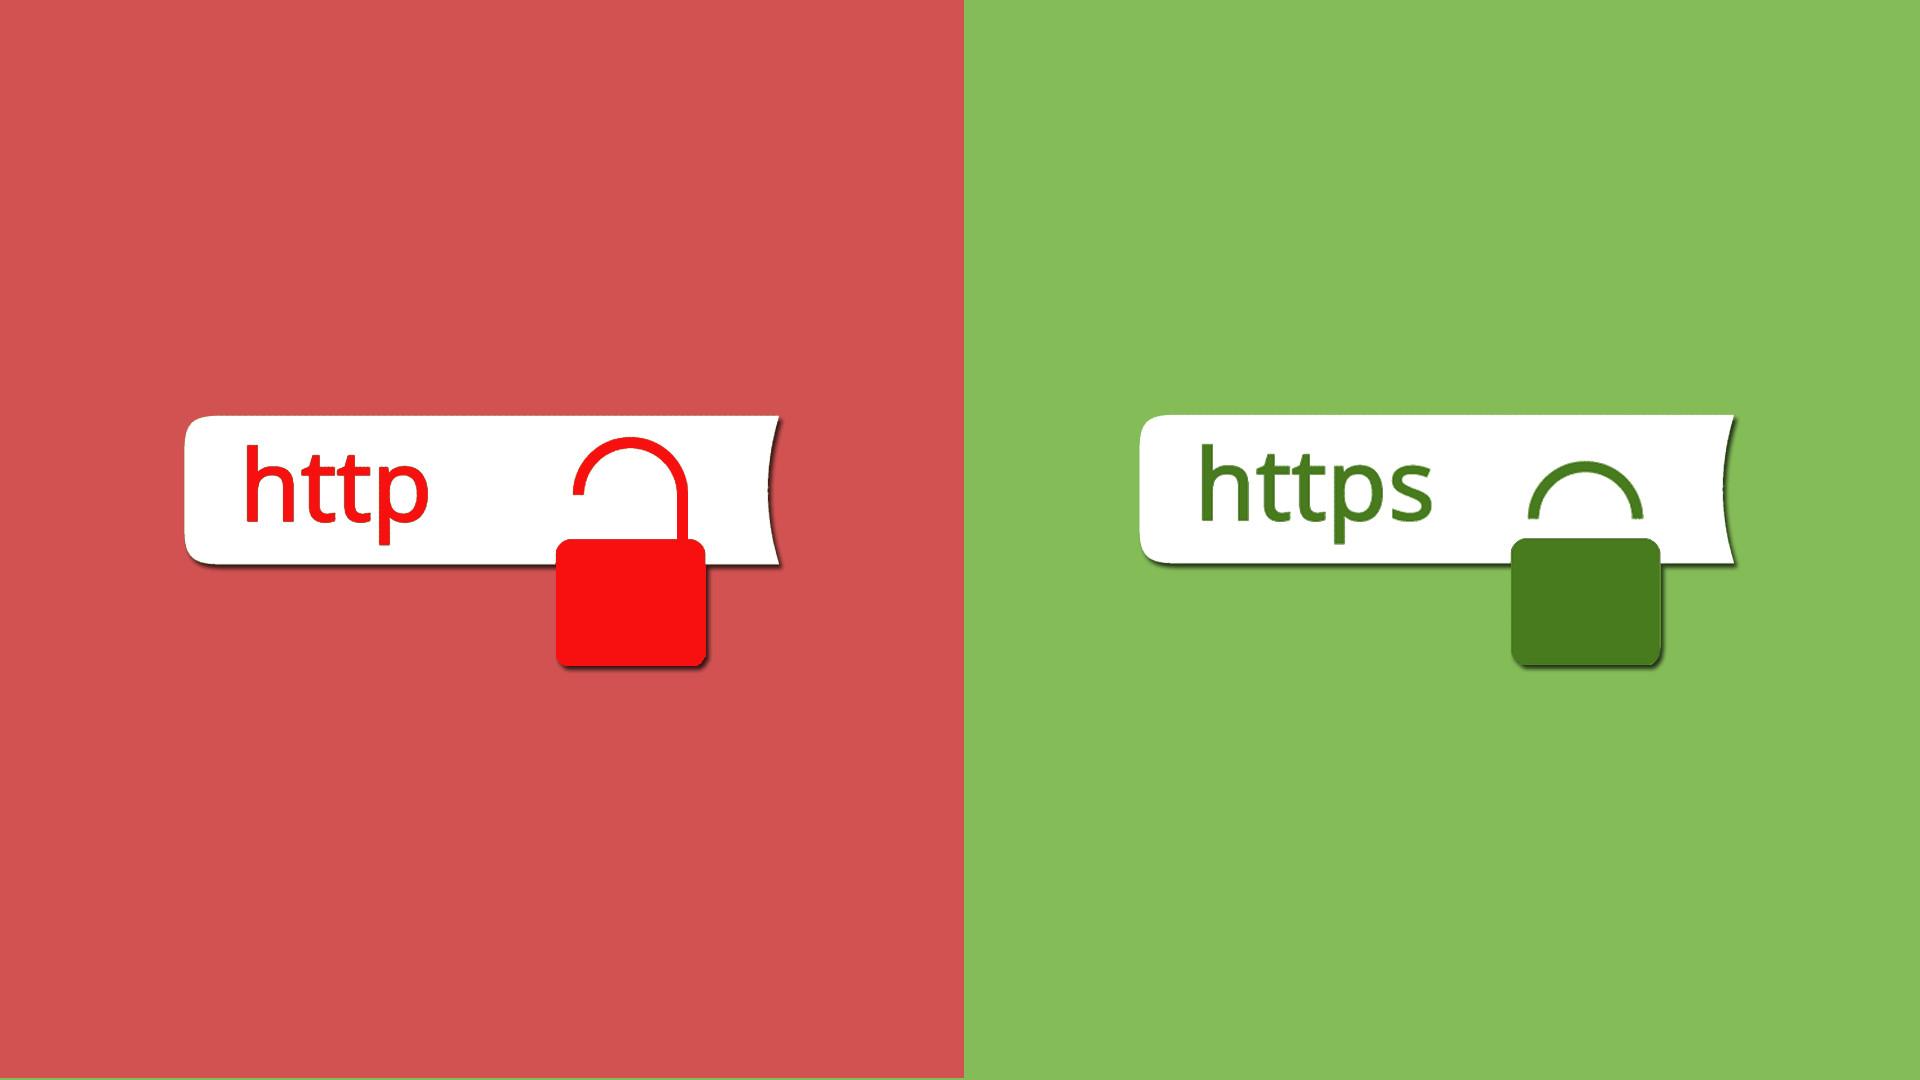 Http: Wordpress Premium themes and Plugins Weblizar